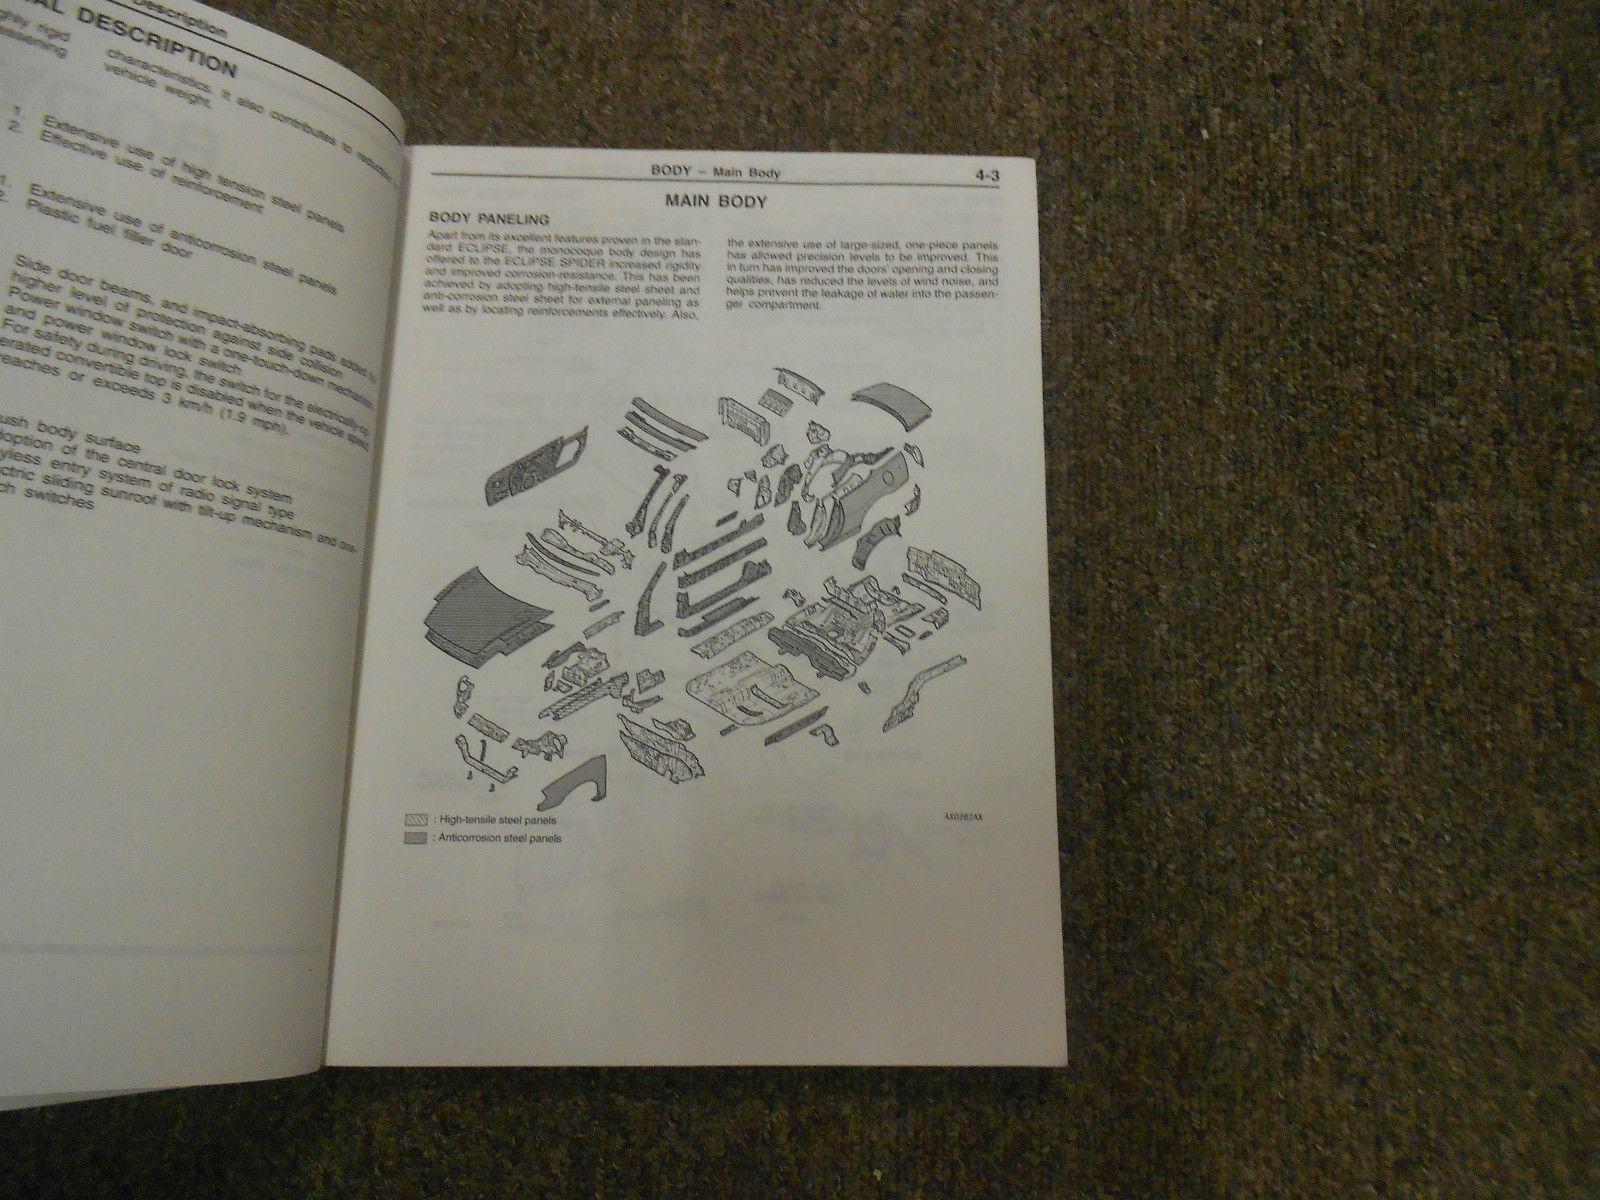 2001 MITSUBISHI Eclipse Spyder Technical Info & Body Repair Service Manual OEM